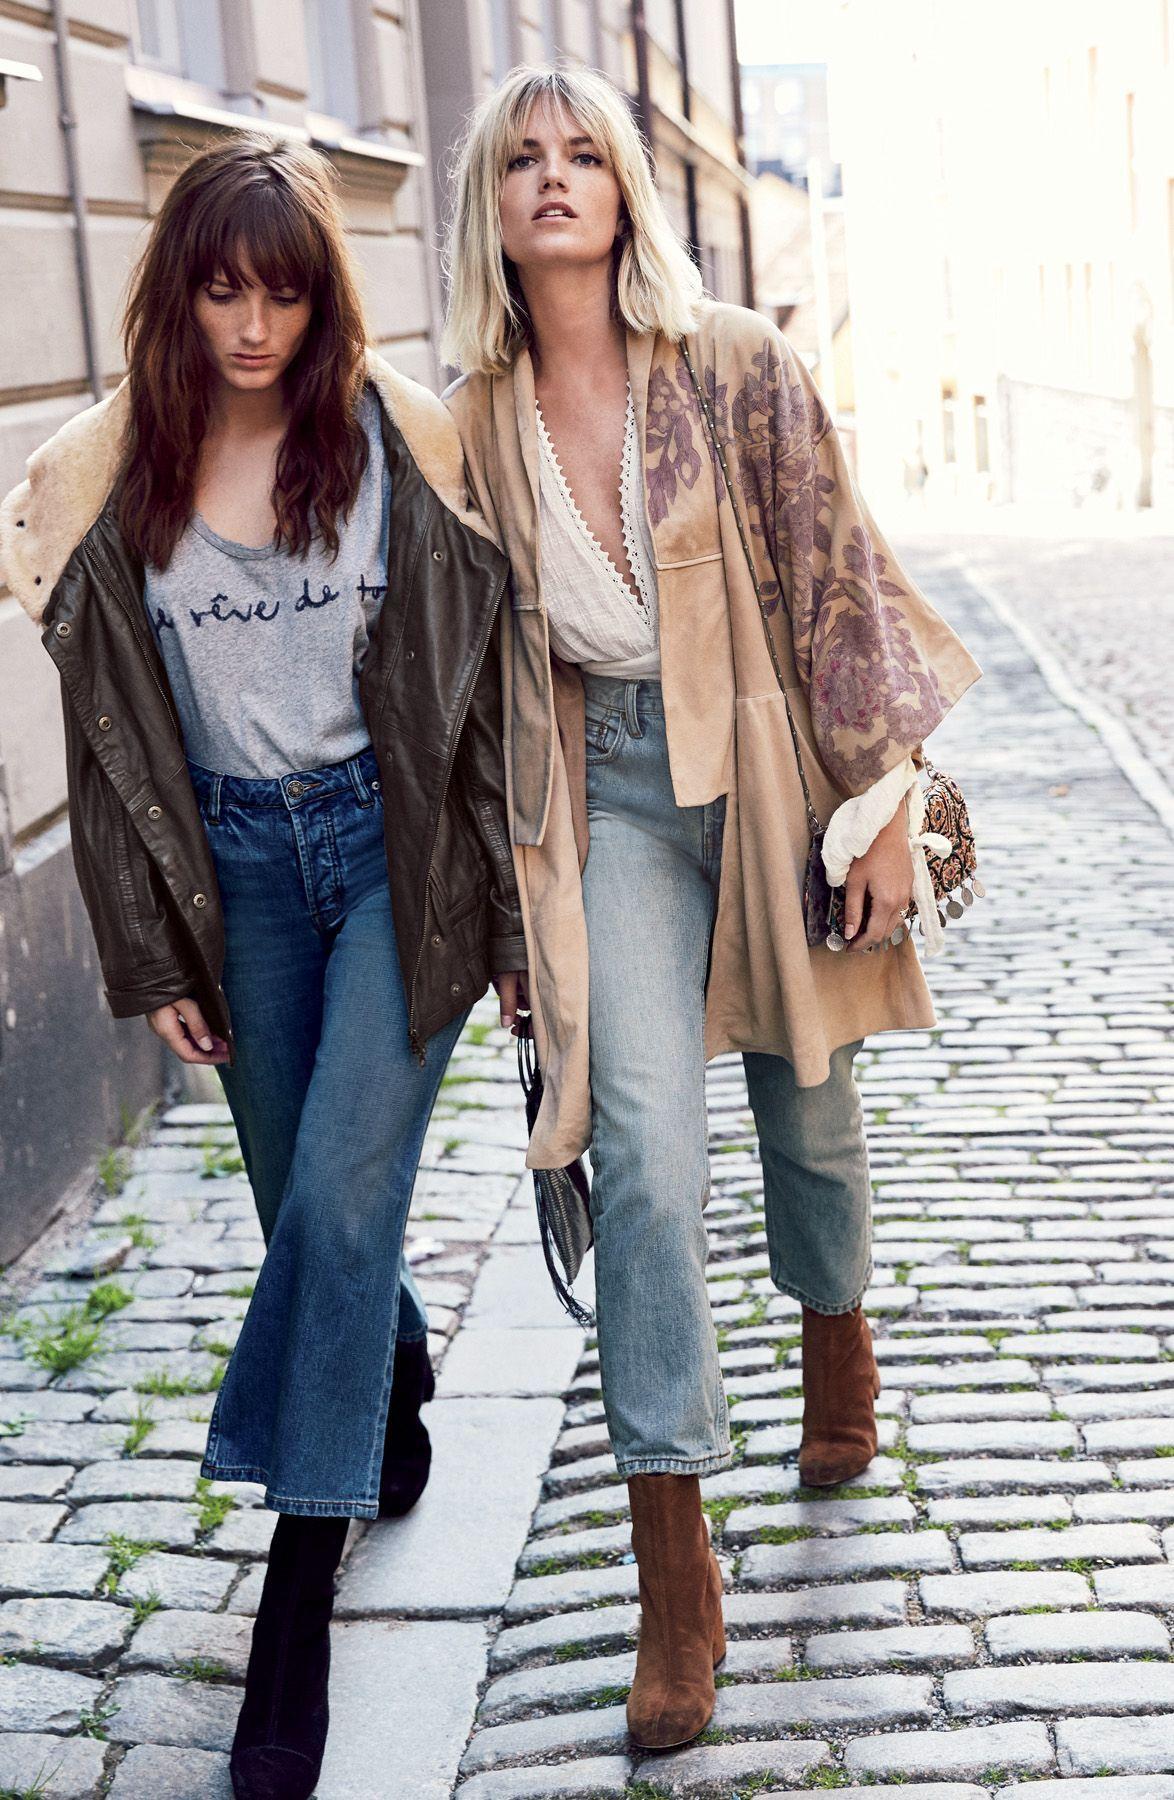 20 perfect fall bohemian street style outfits – boho fashion ideas to wear everyday autumn – Bonjour Kate Blog